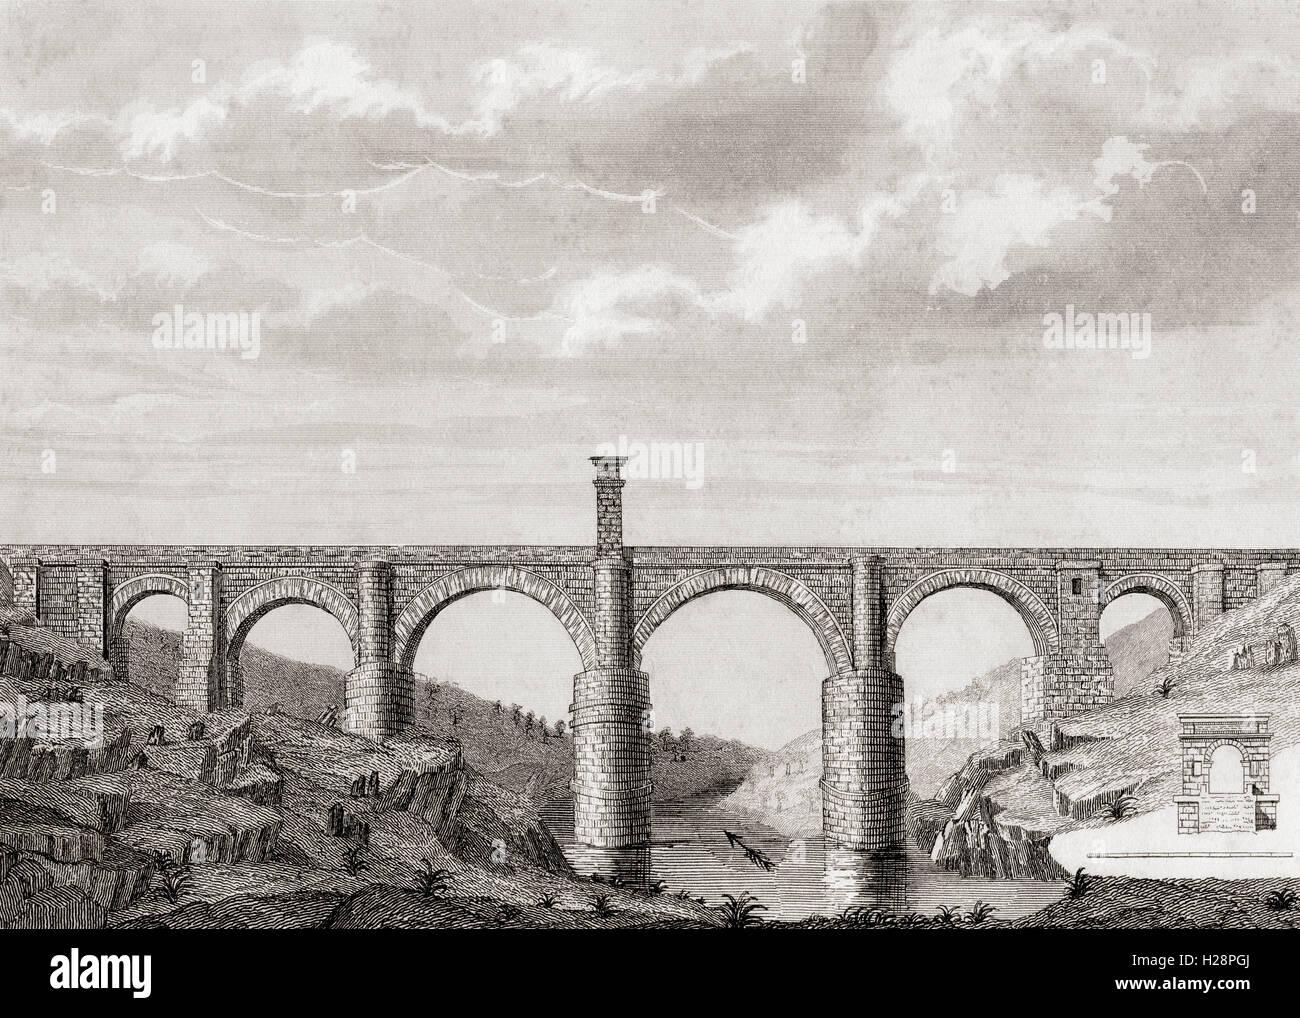 The Alcántara Bridge, aka Trajan's Bridge at Alcantara, Spain.  Second century Roman stone arch bridge - Stock Image